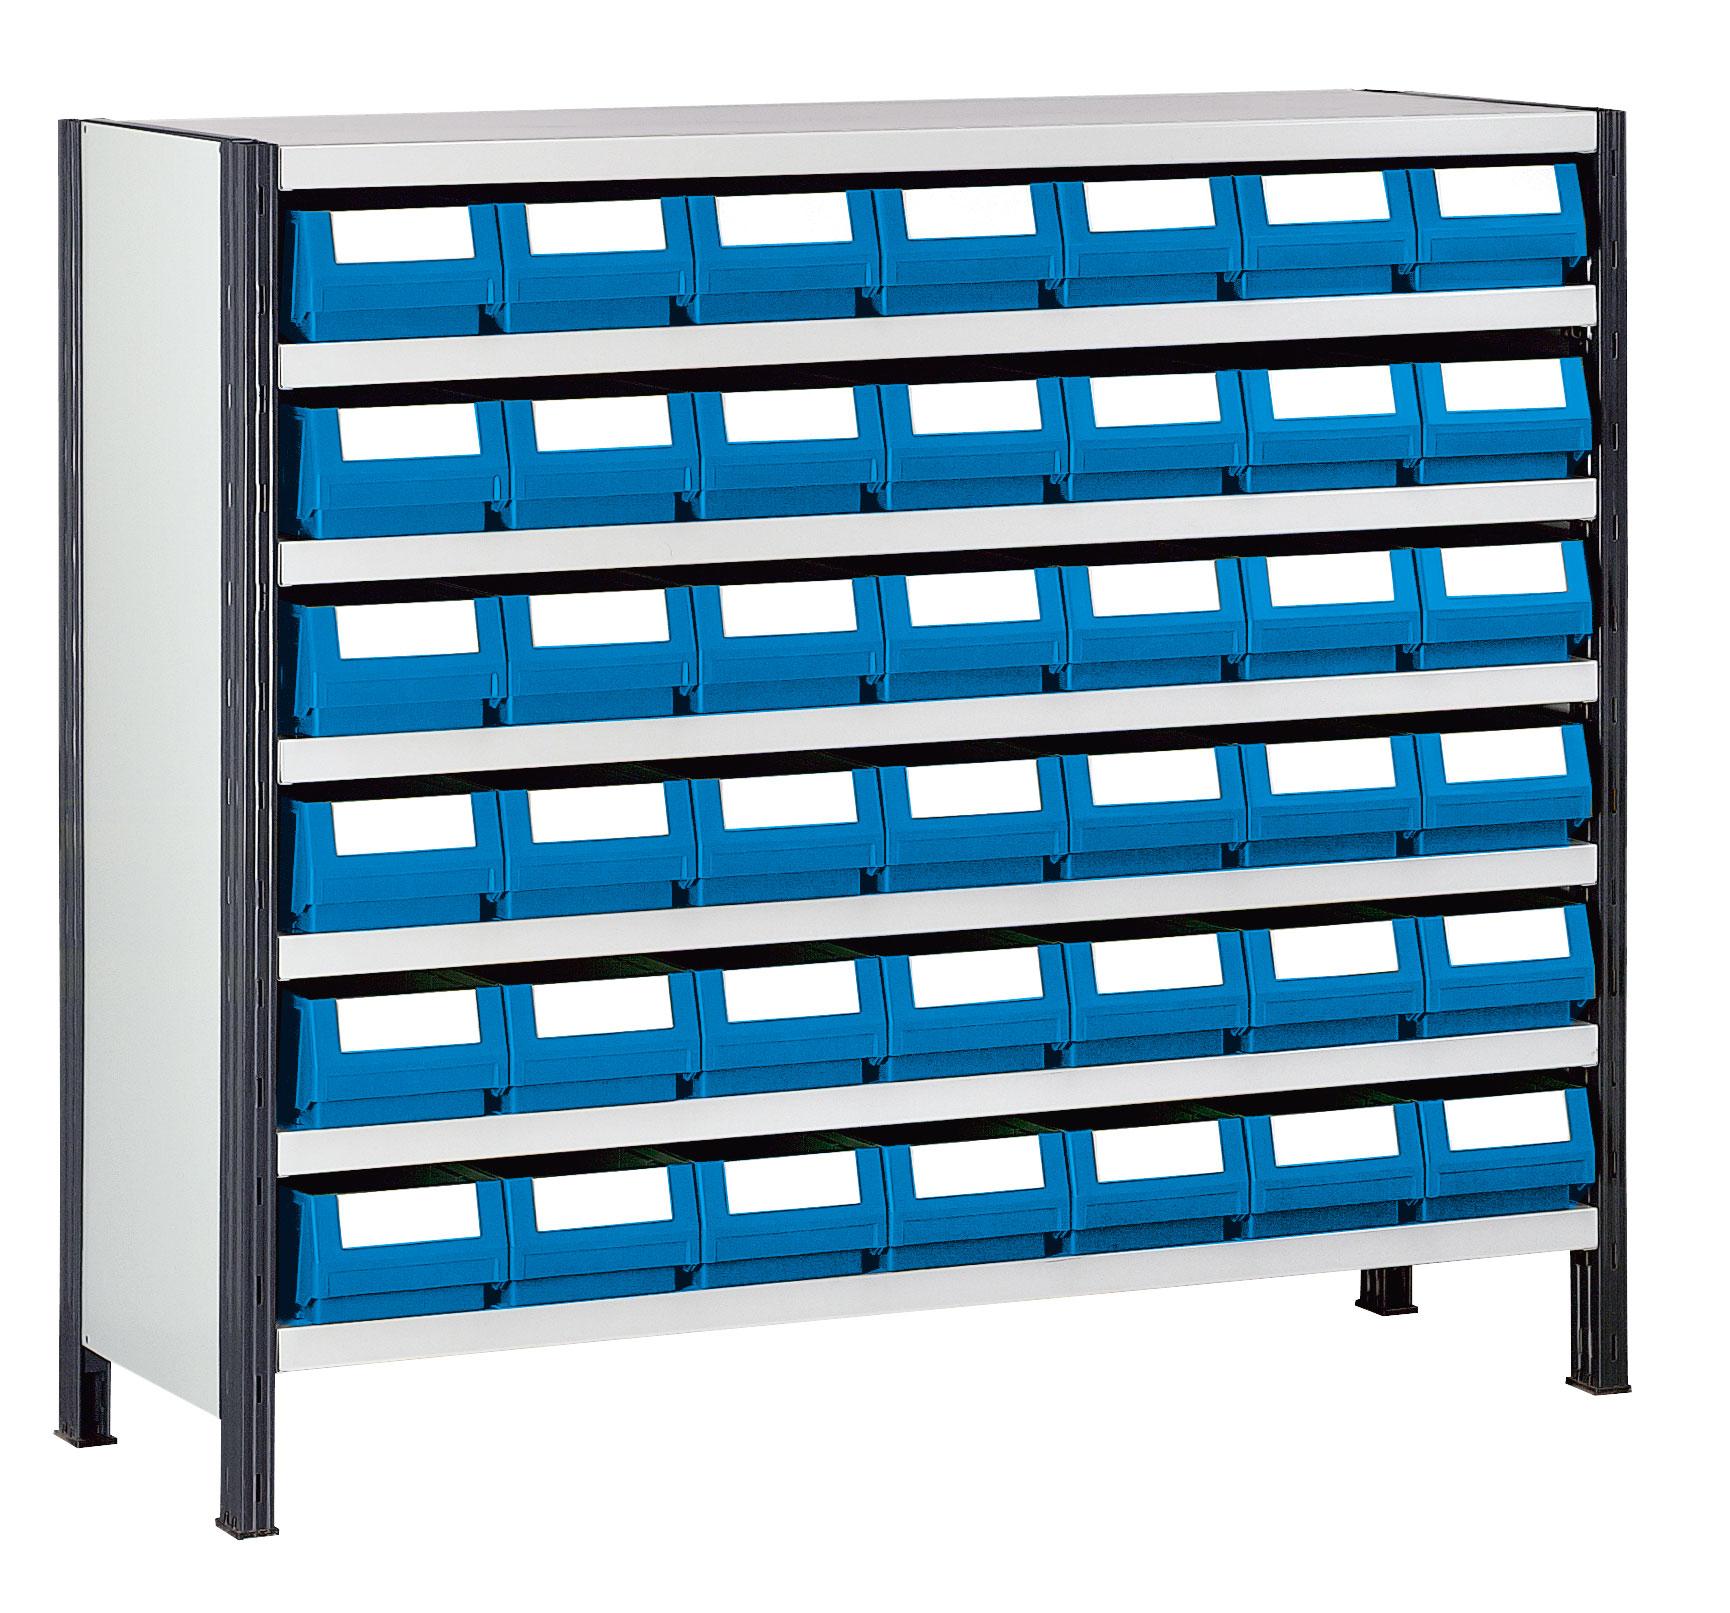 Rayonnage comptoir bas avec 42 bacs tiroirs prof 30 cm